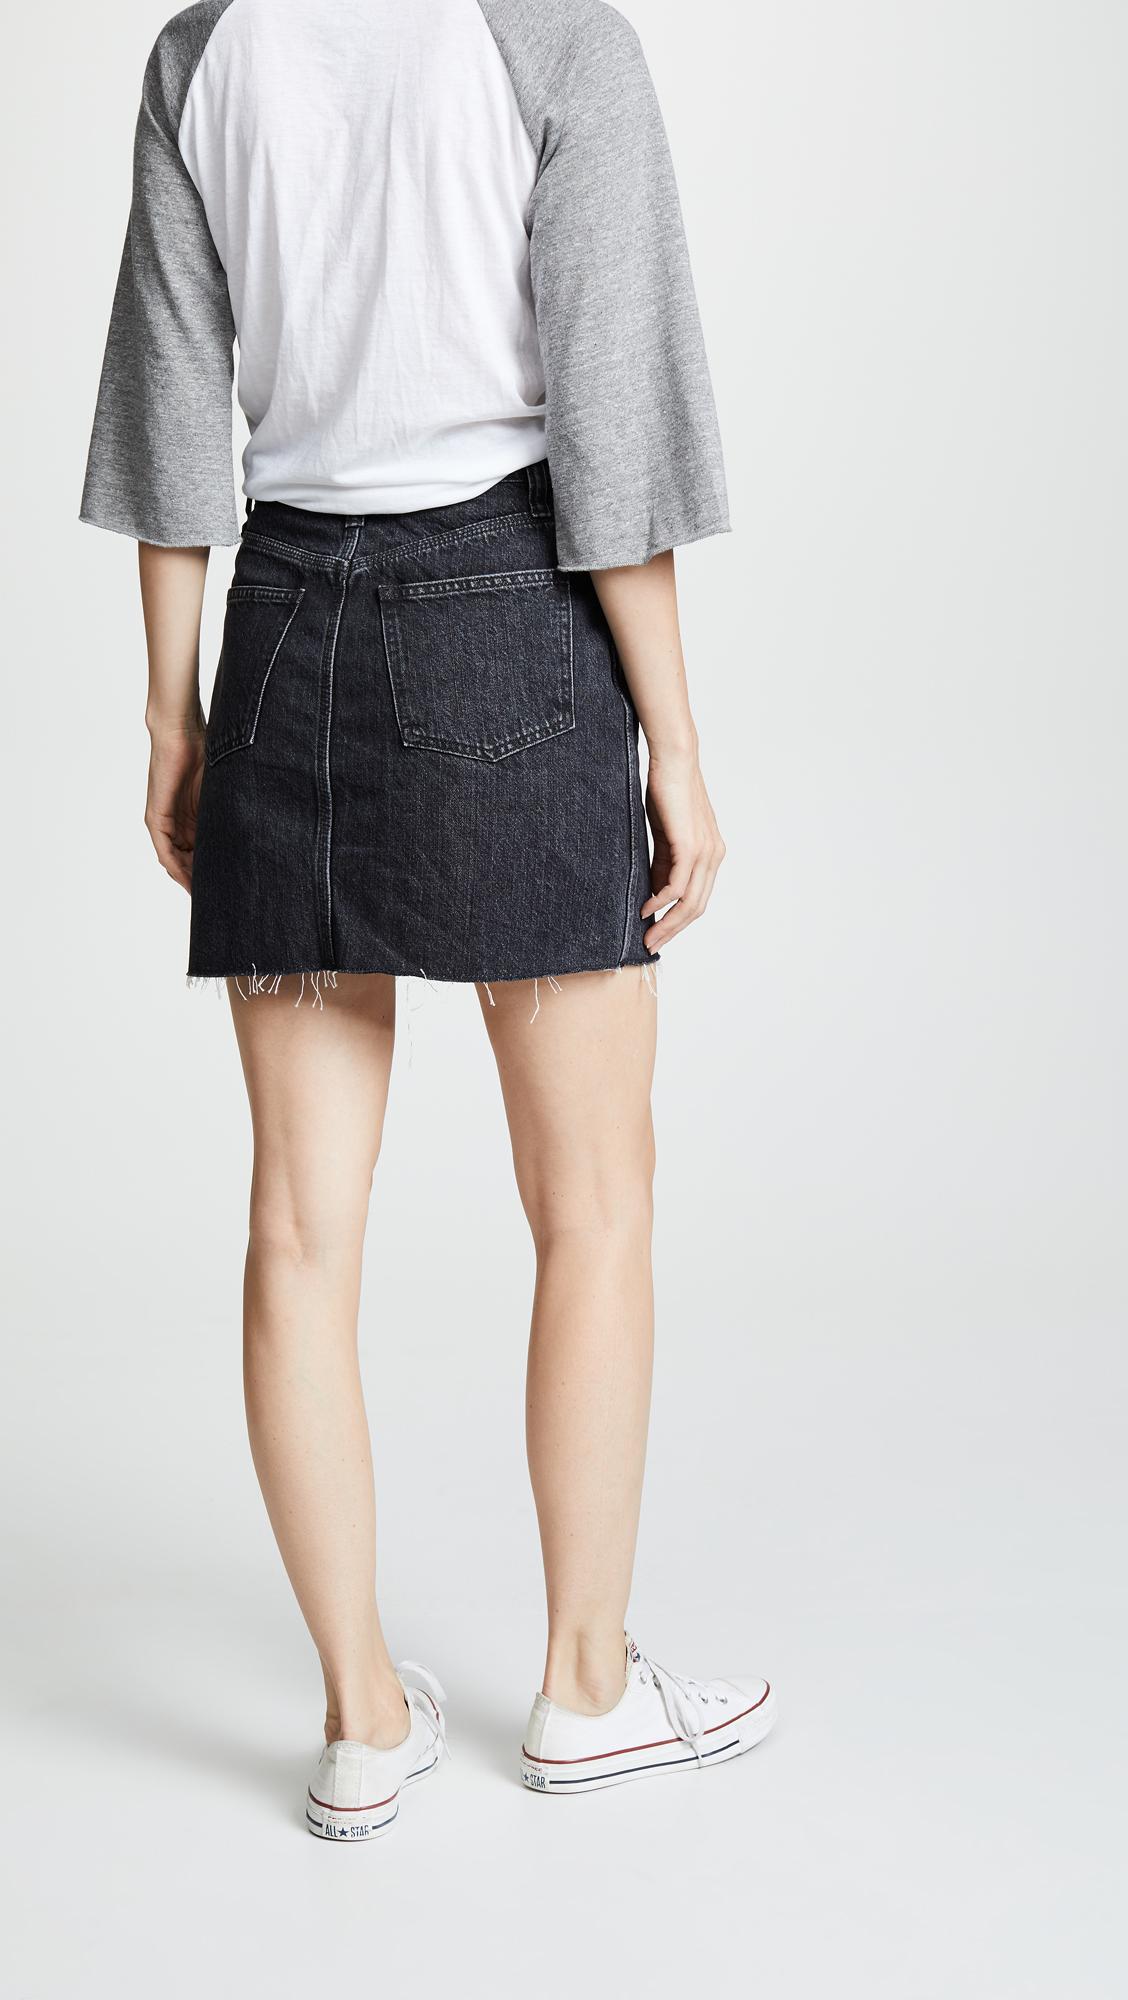 715ffaac7 Madewell Vintage Black Denim Skirt | SHOPBOP